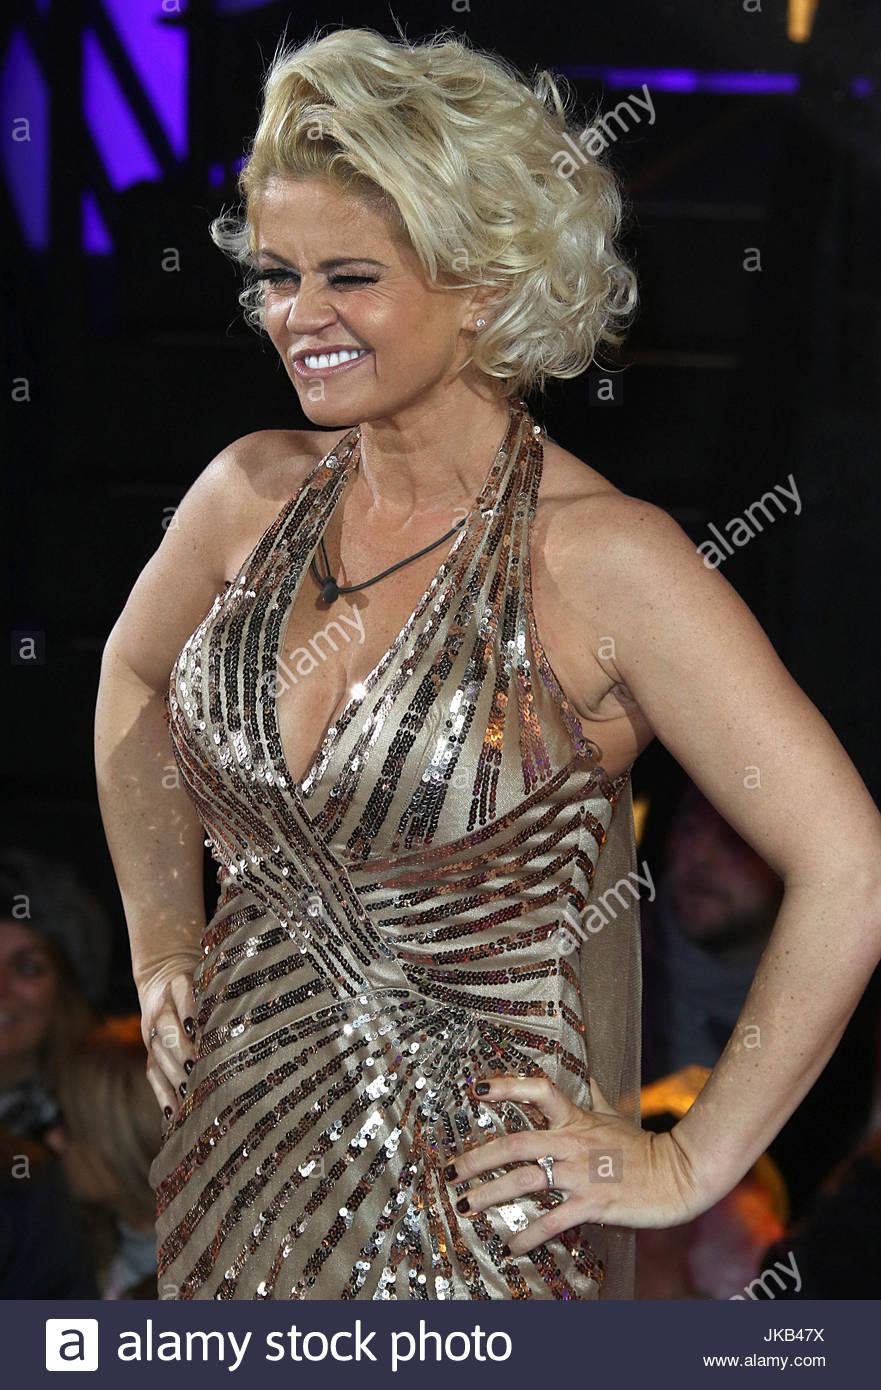 Celebrites Danniella Westbrook nudes (62 photo), Ass, Leaked, Twitter, lingerie 2018